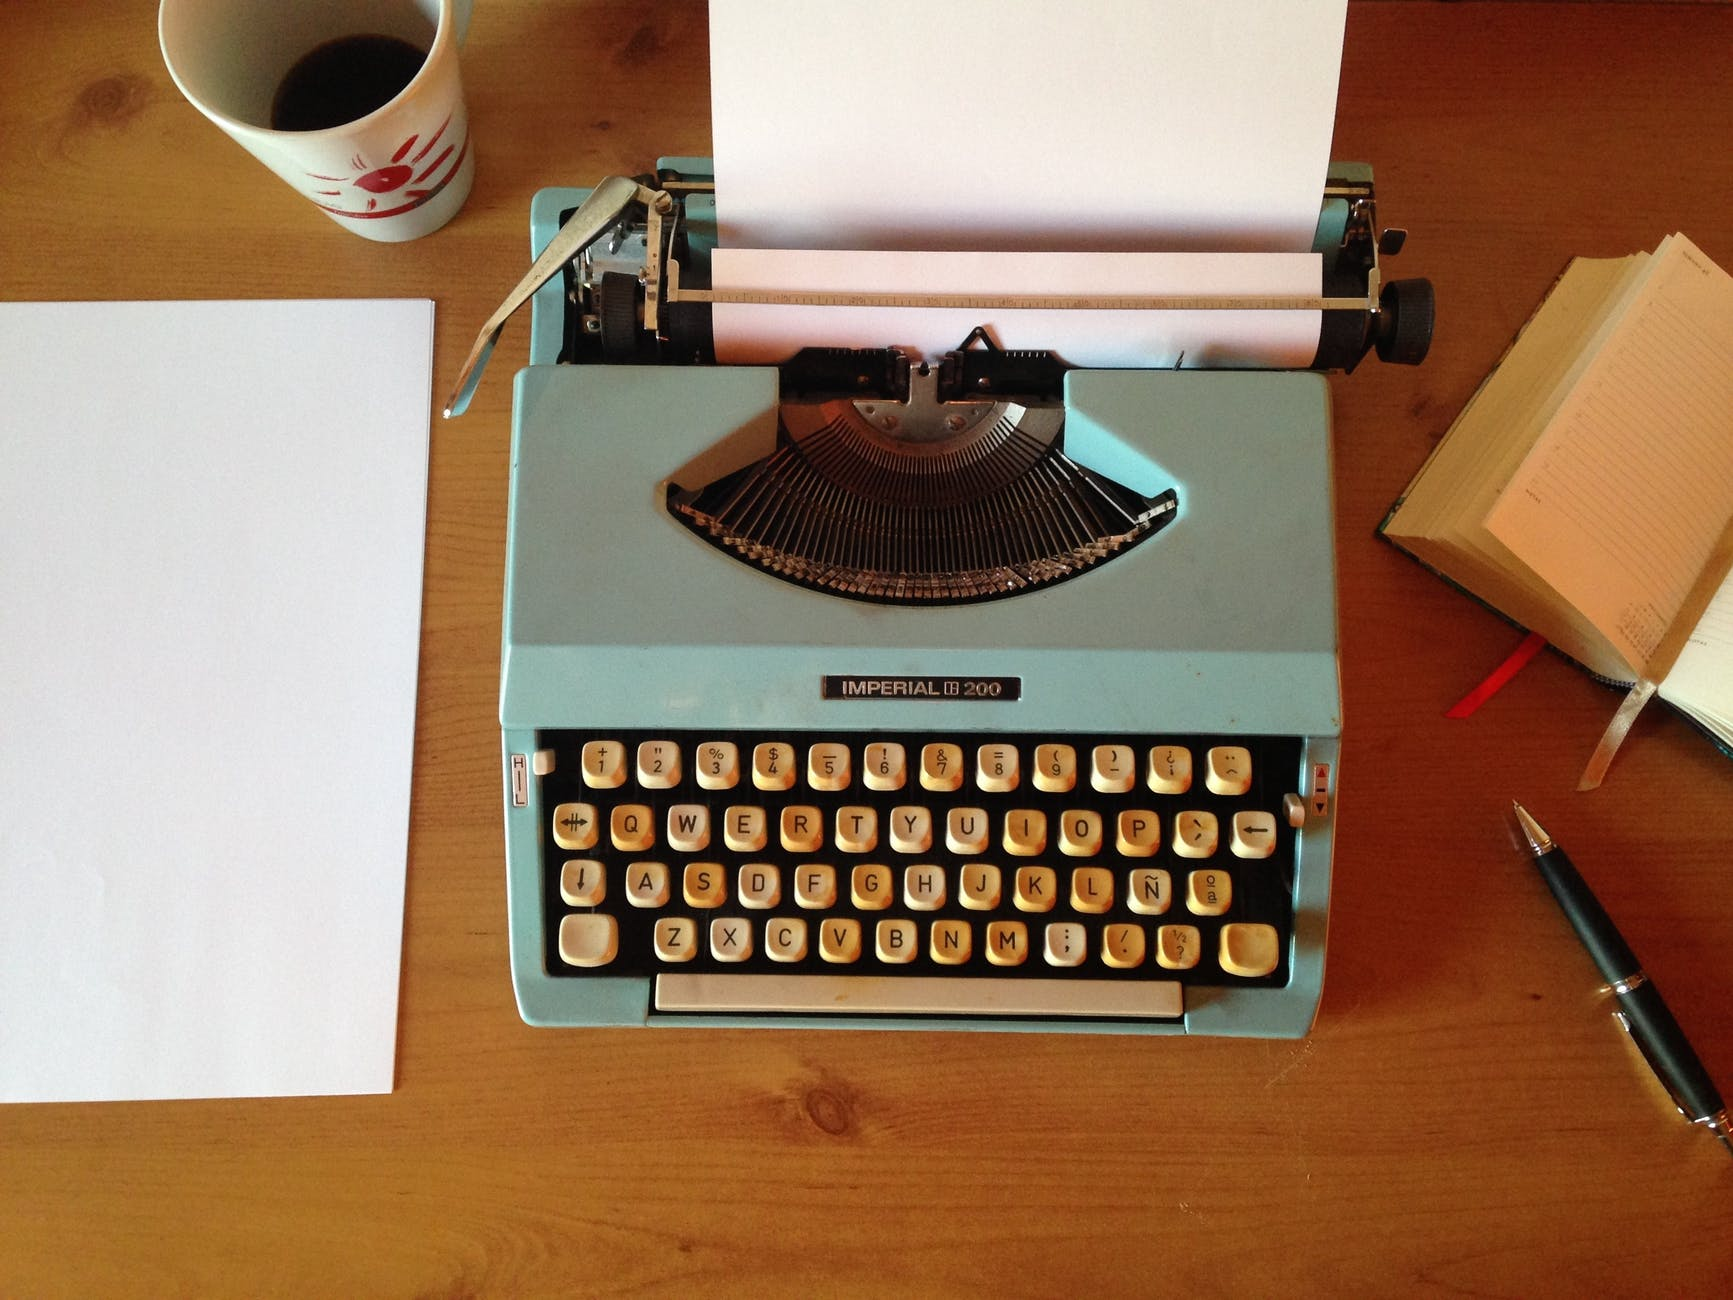 Typewriter (public domain image)